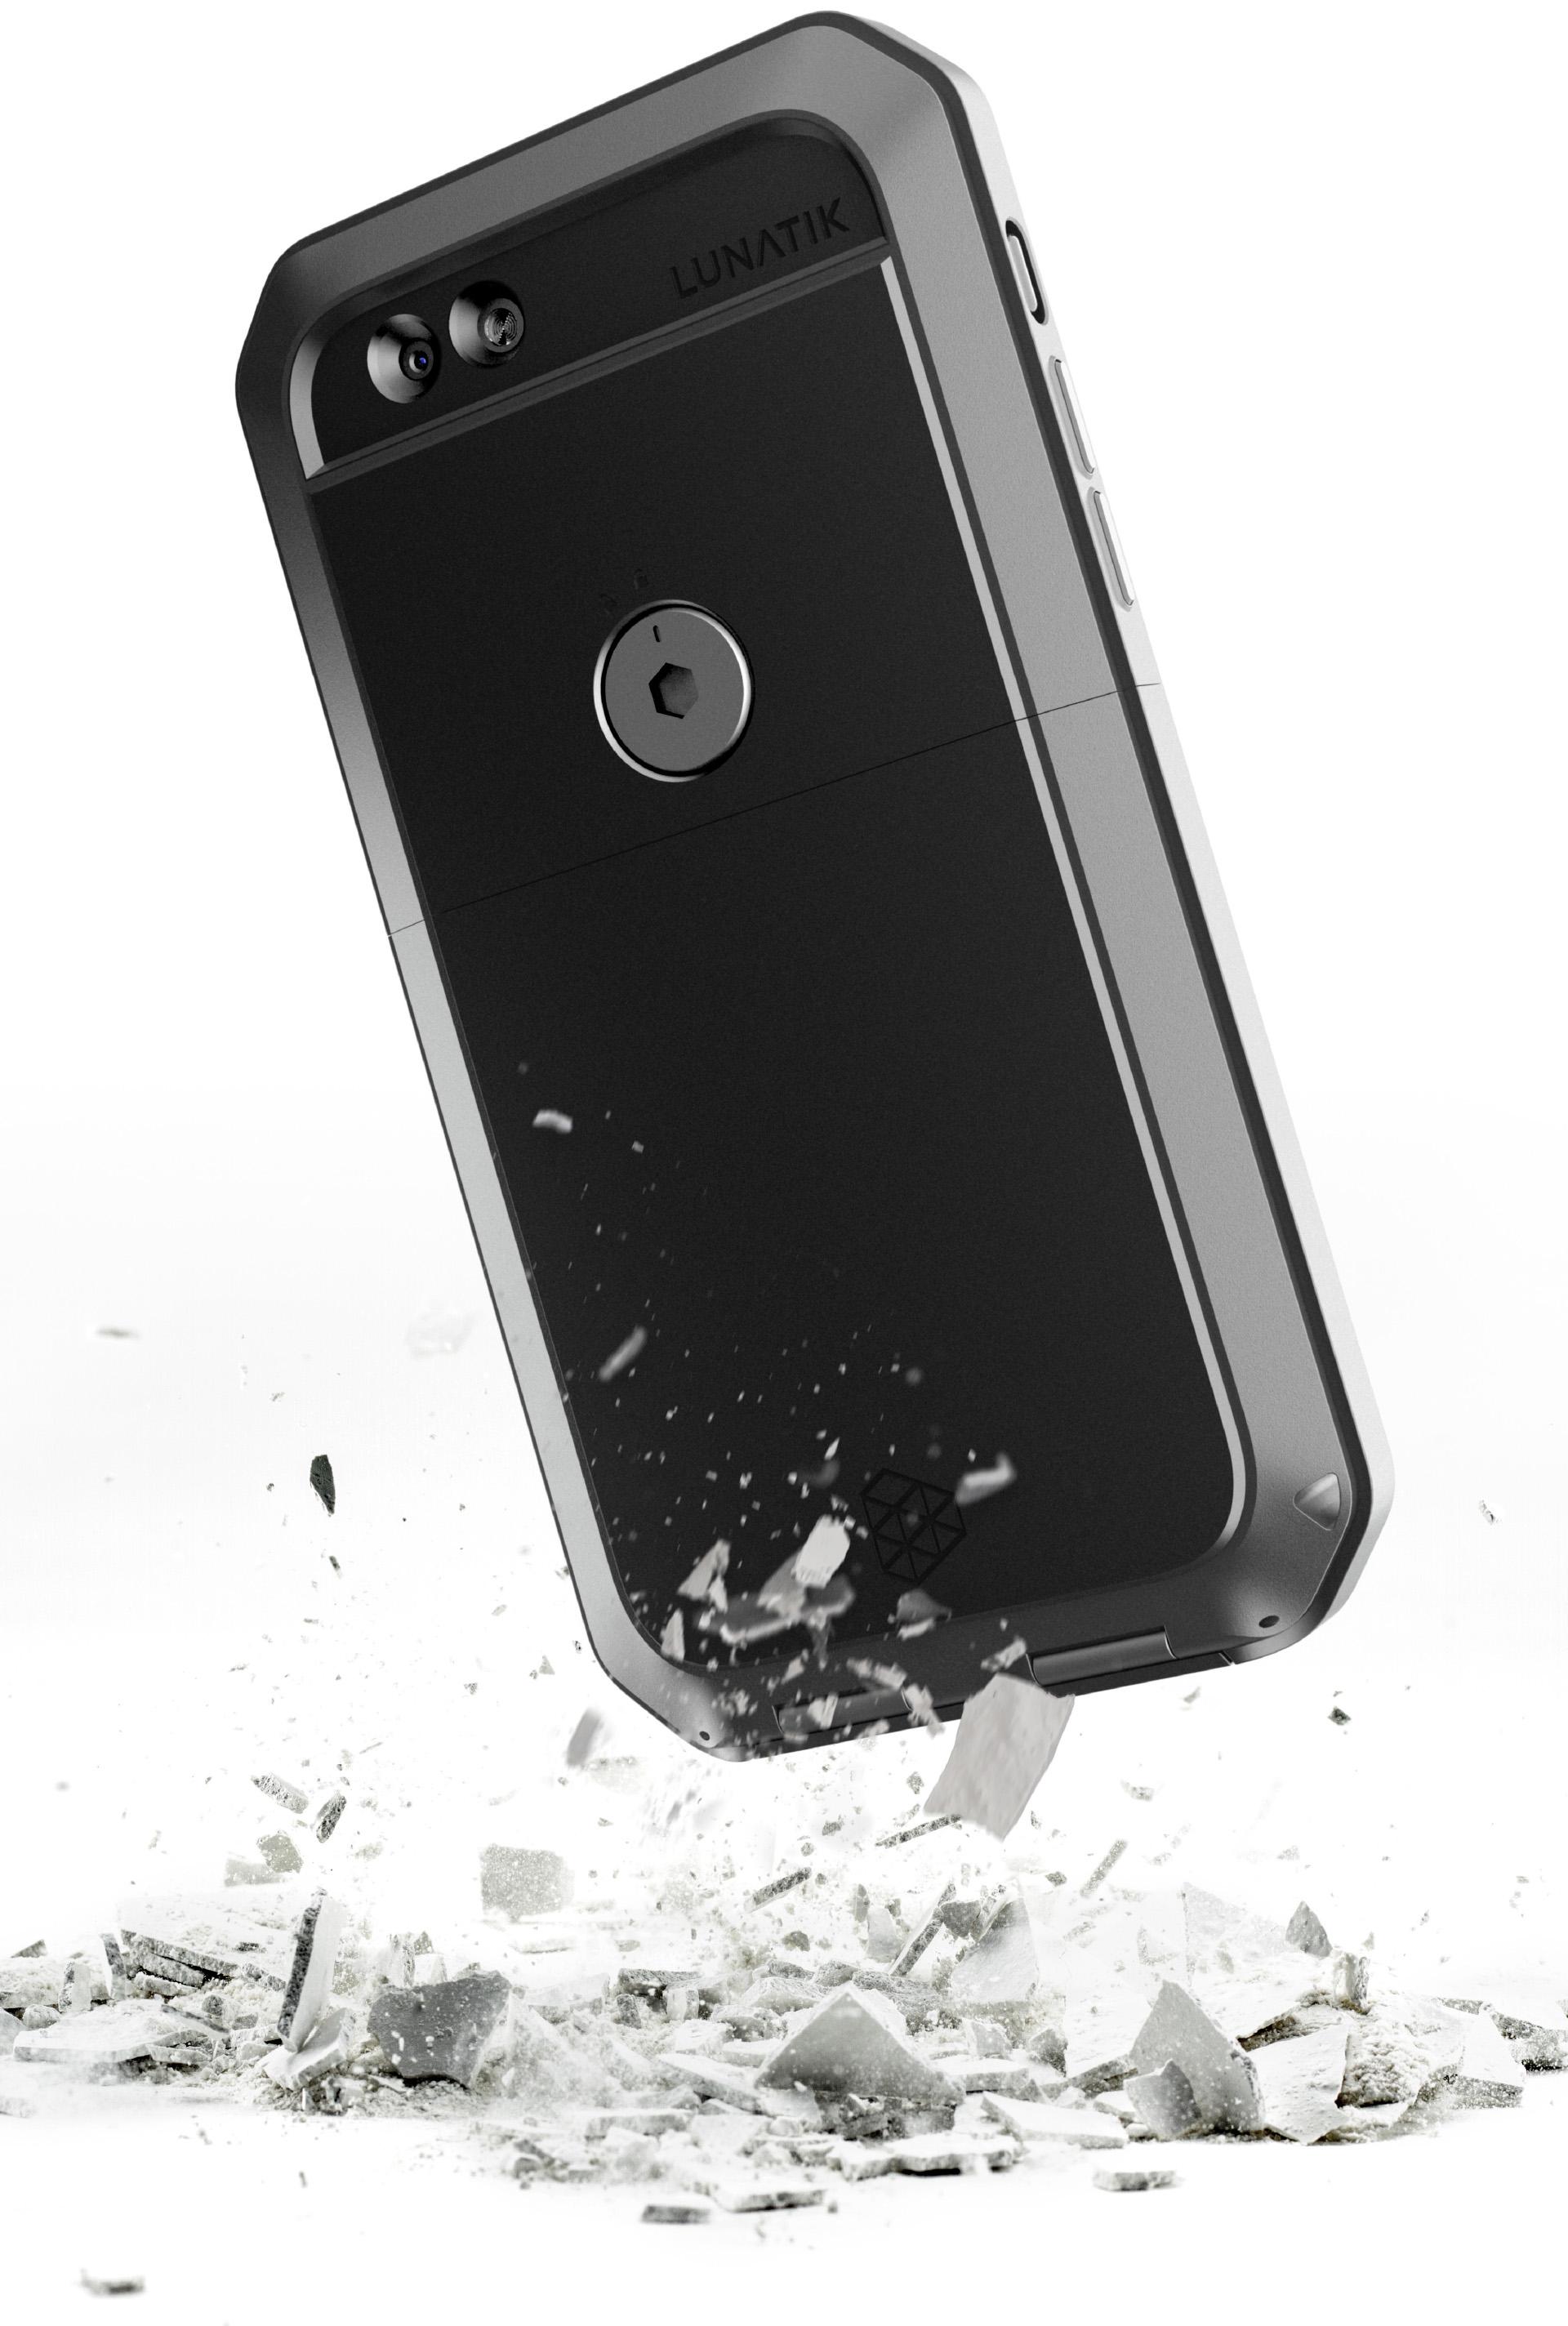 lunatik_iphone6_taktik360_4